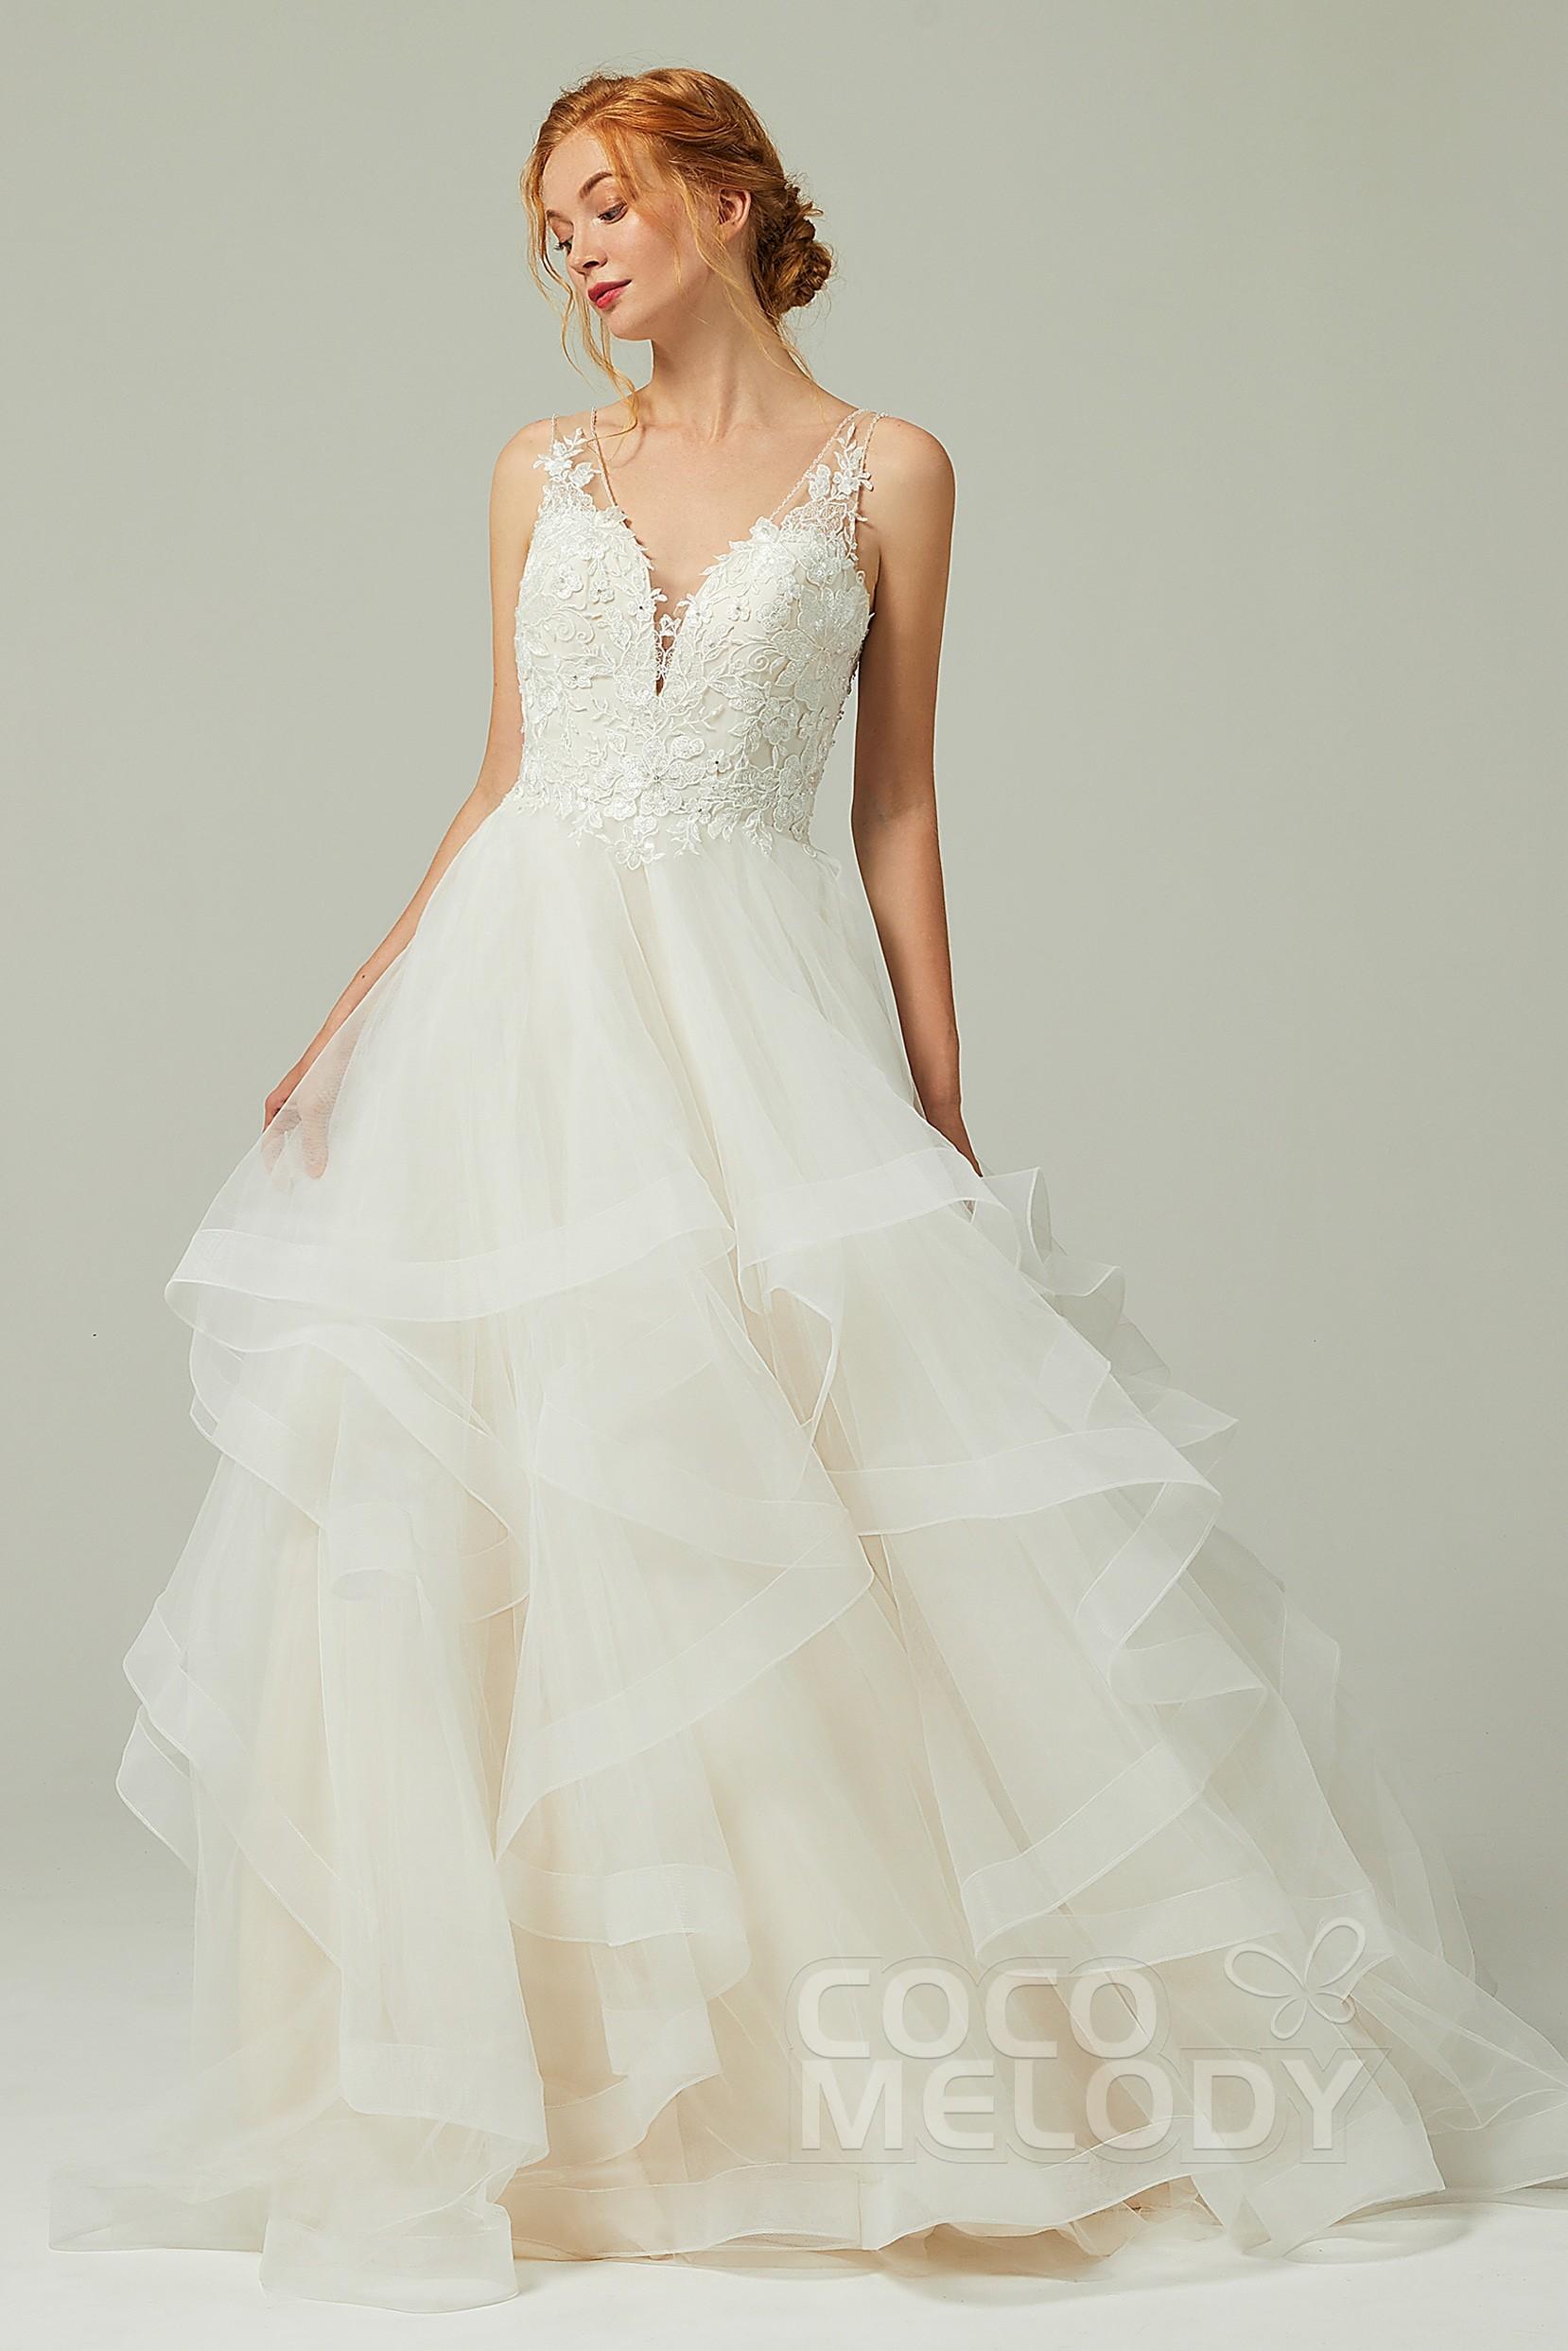 wwww.santabarbarawedding.com | COCOMELODY | A-Line Court Train Tulle Wedding Dress